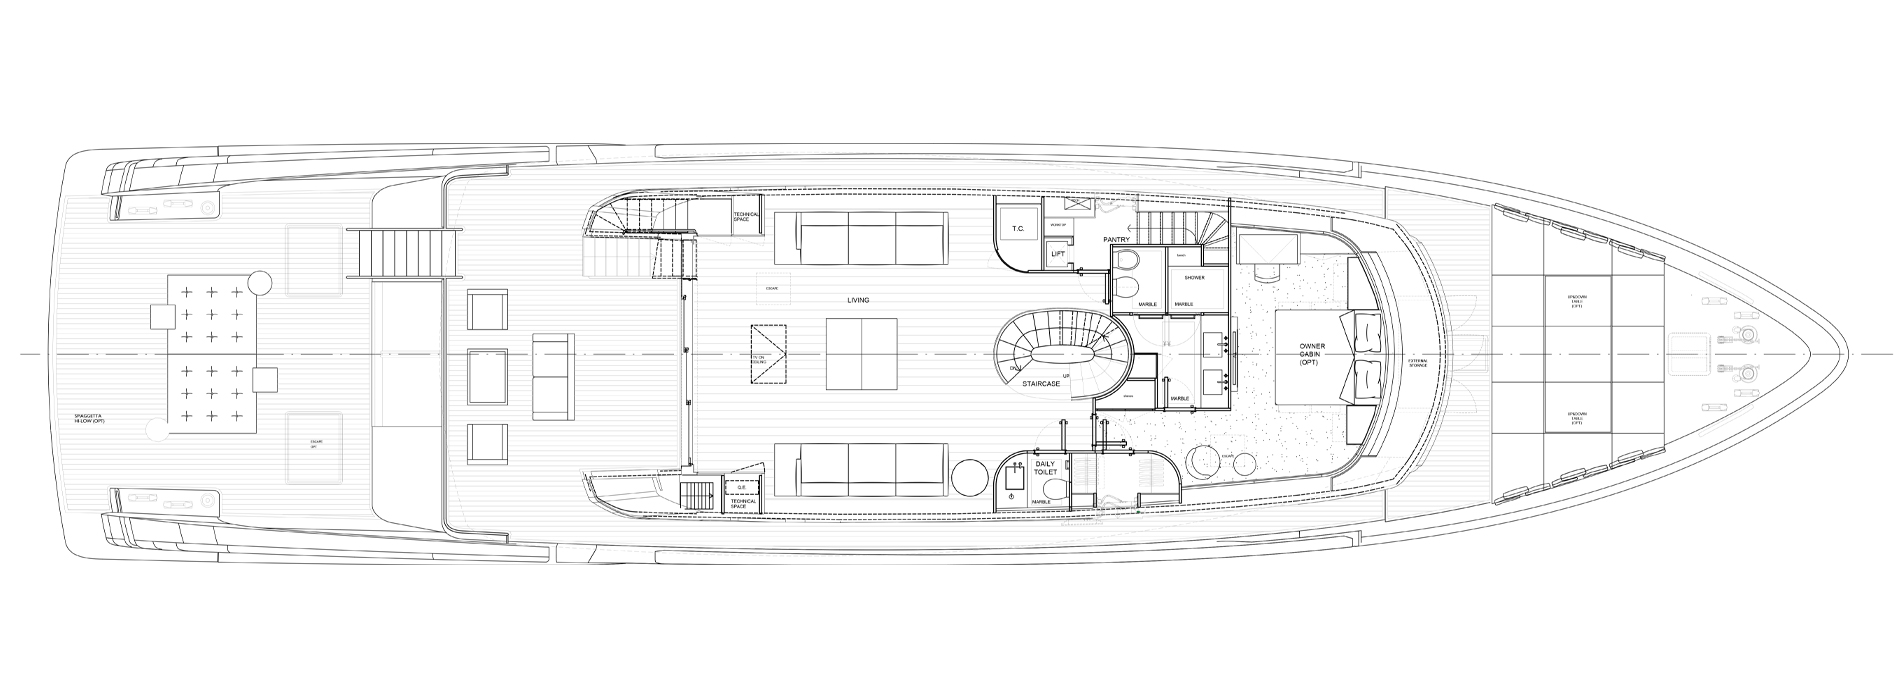 Sanlorenzo Yachts SX112 Main deck Version C